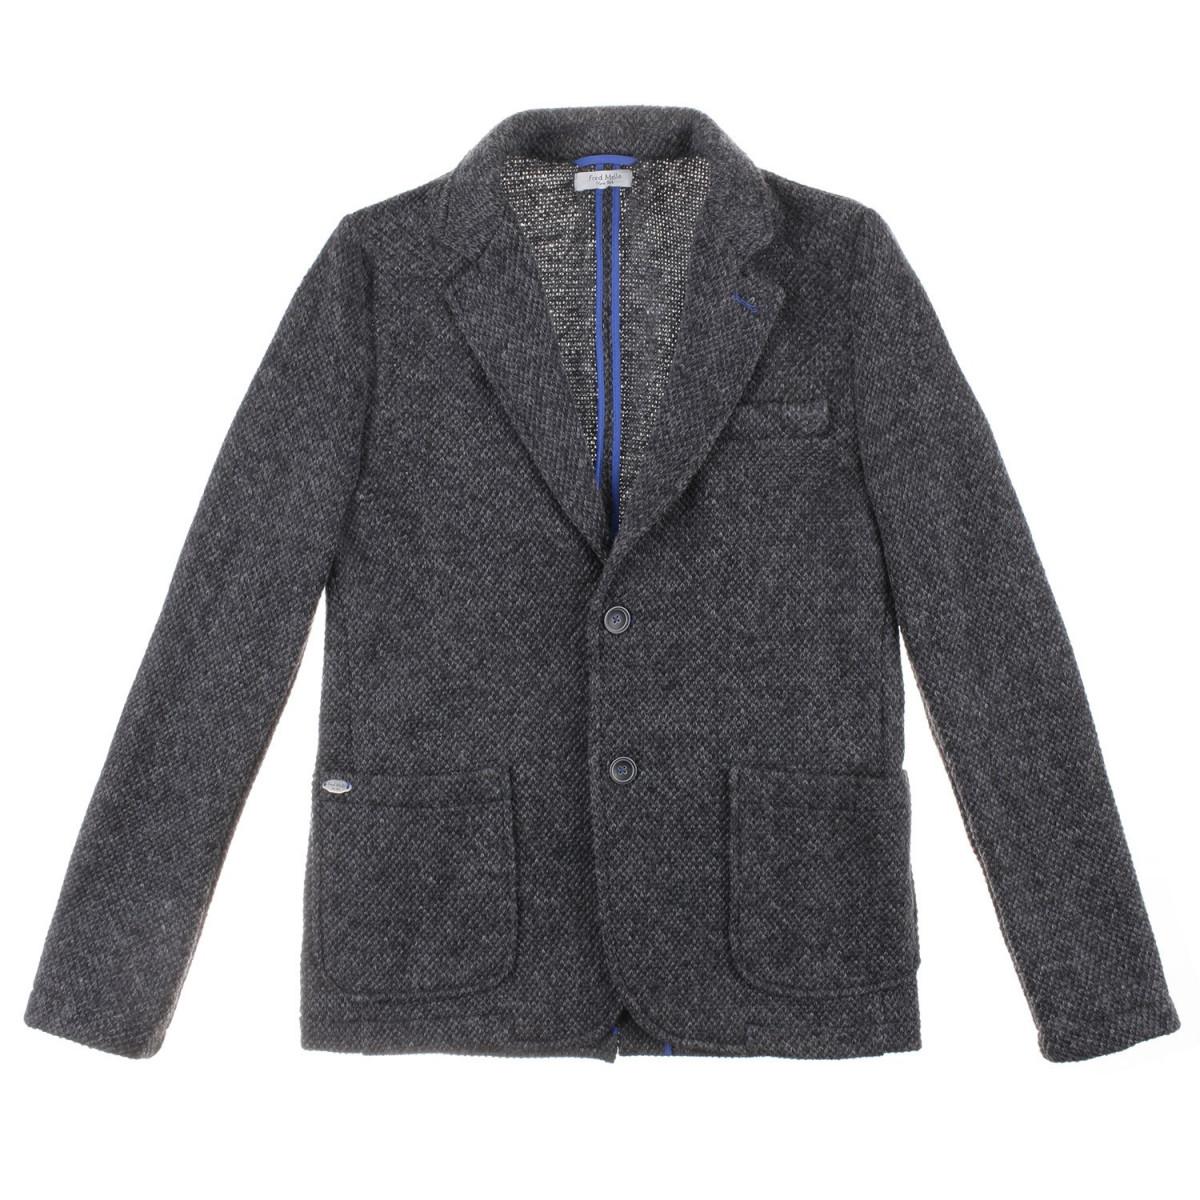 7ebdc1dd68a68 FRED MELLO - Giacca in misto lana - Jacket - Outerwear - MAN ...